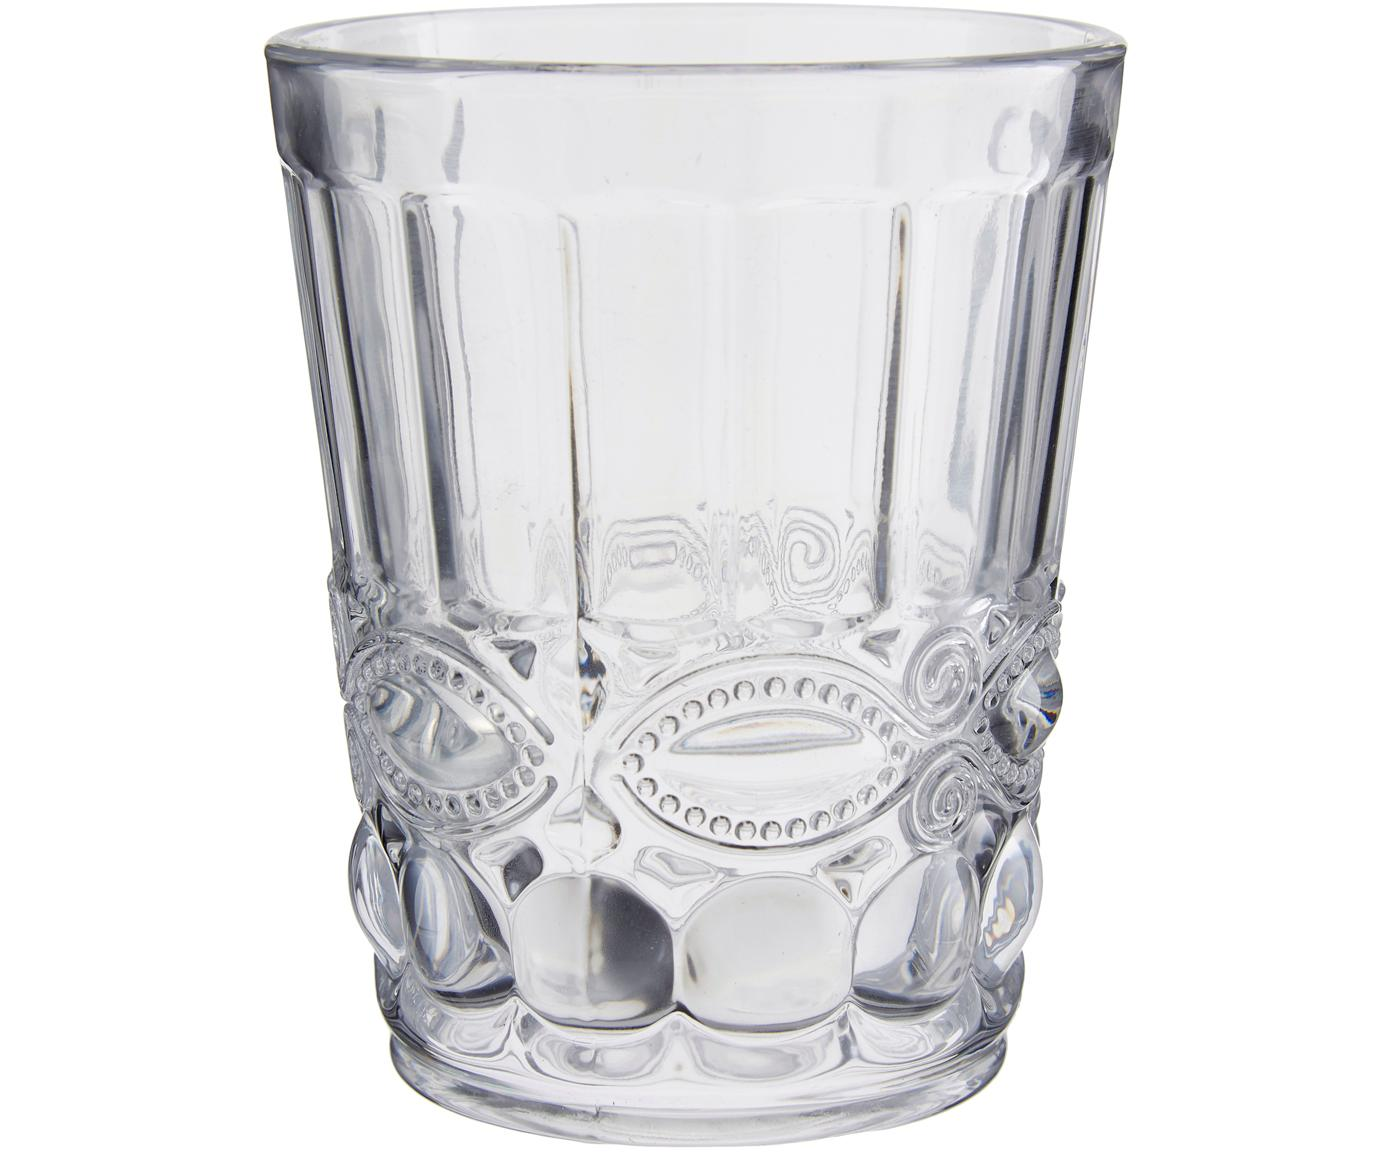 Wassergläser Nobilis mit verspieltem Relief, 6er-Set, Glas, Transparent, Ø 8 x H 10 cm